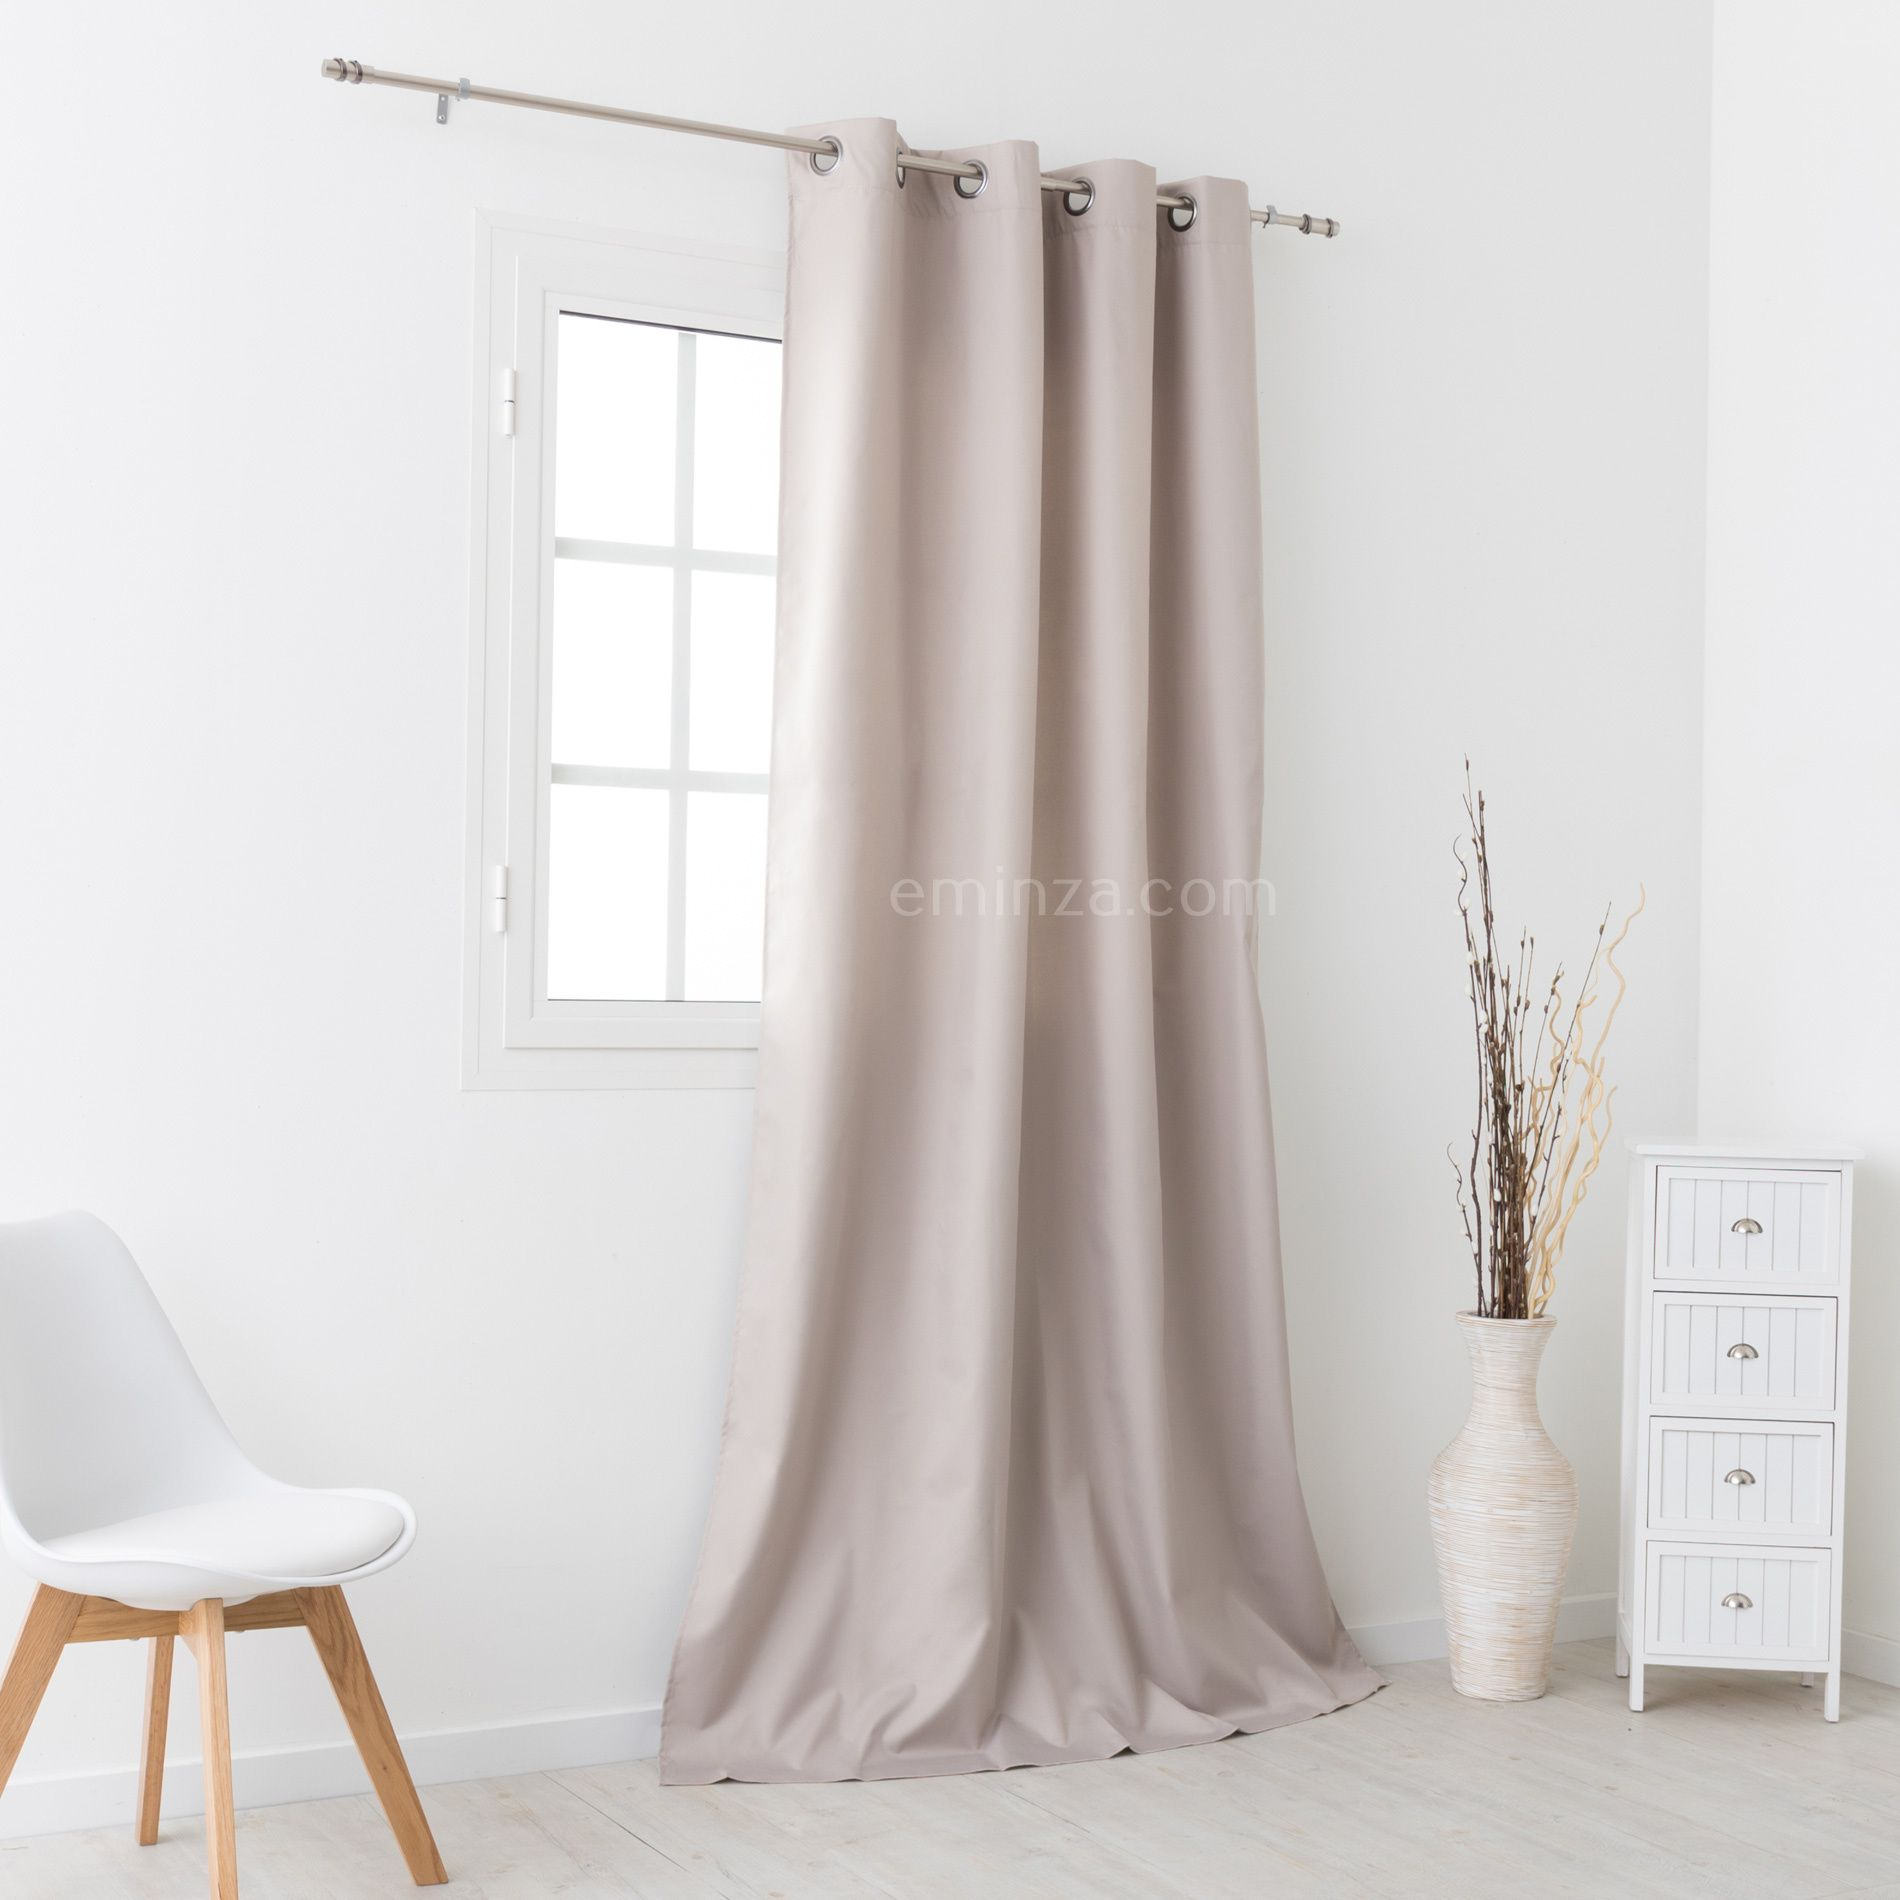 rideau thermique 140 x h250 cm sun taupe rideau isolant eminza. Black Bedroom Furniture Sets. Home Design Ideas